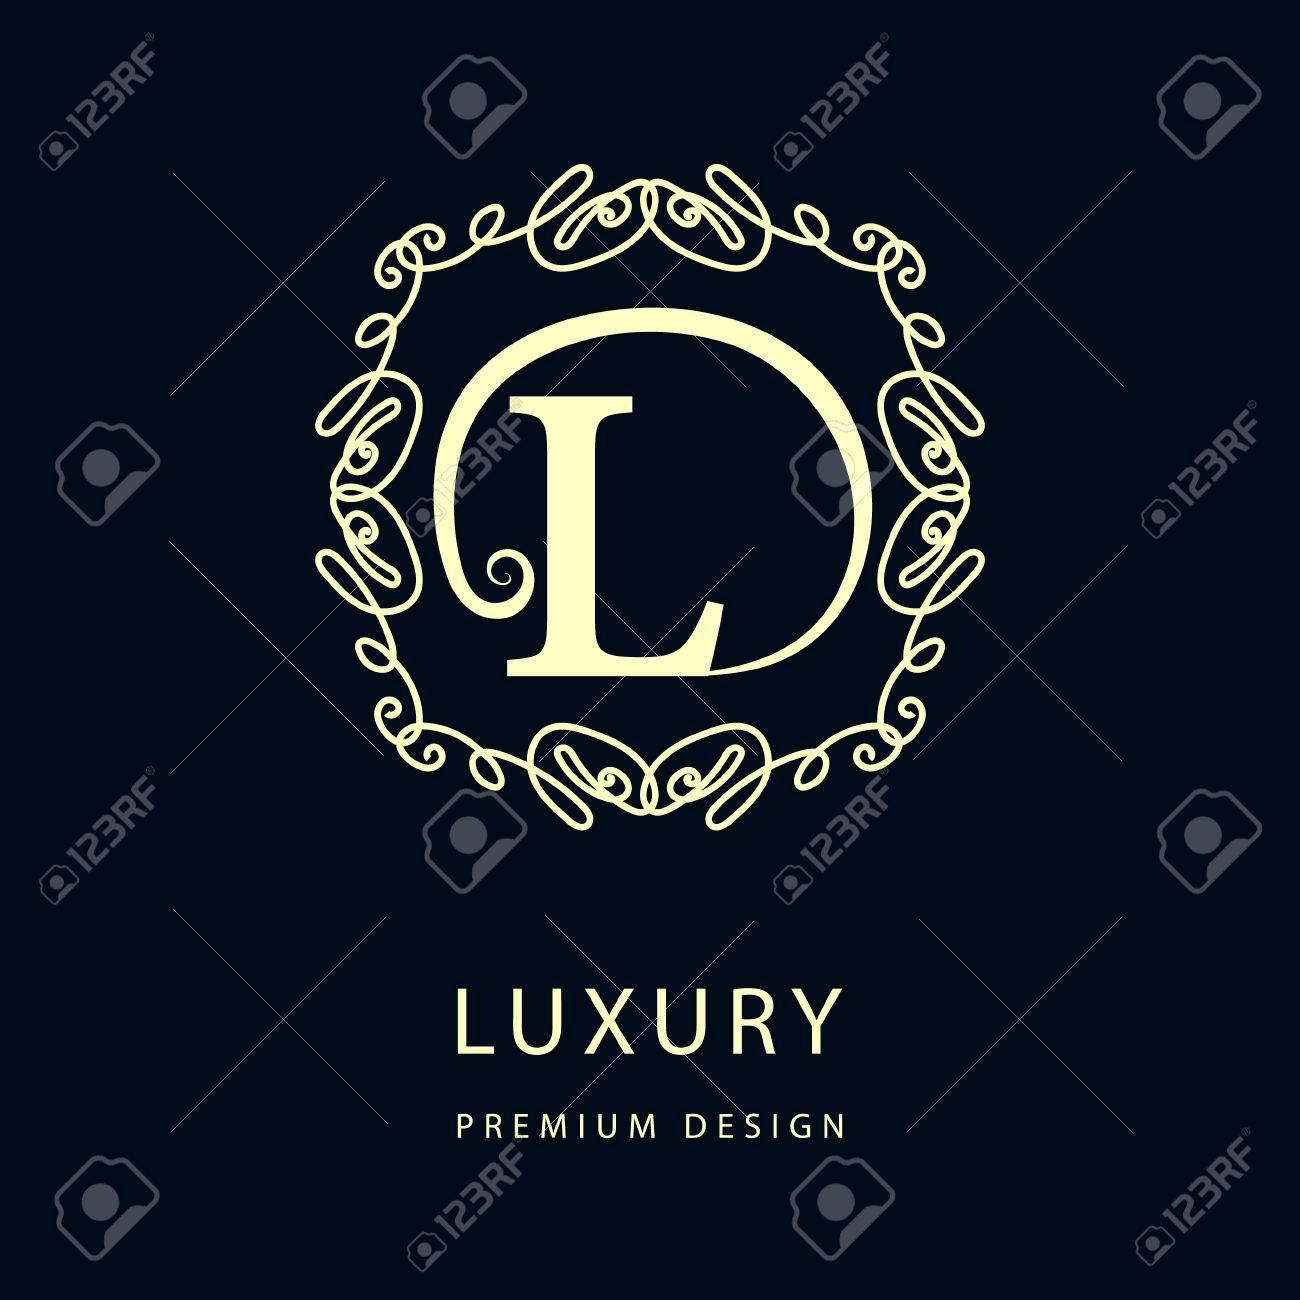 Tj initial luxury ornament monogram logo stock vector - L Floral Simple And Graceful Floral Monogram Design Template Elegant Line Art Logo Design